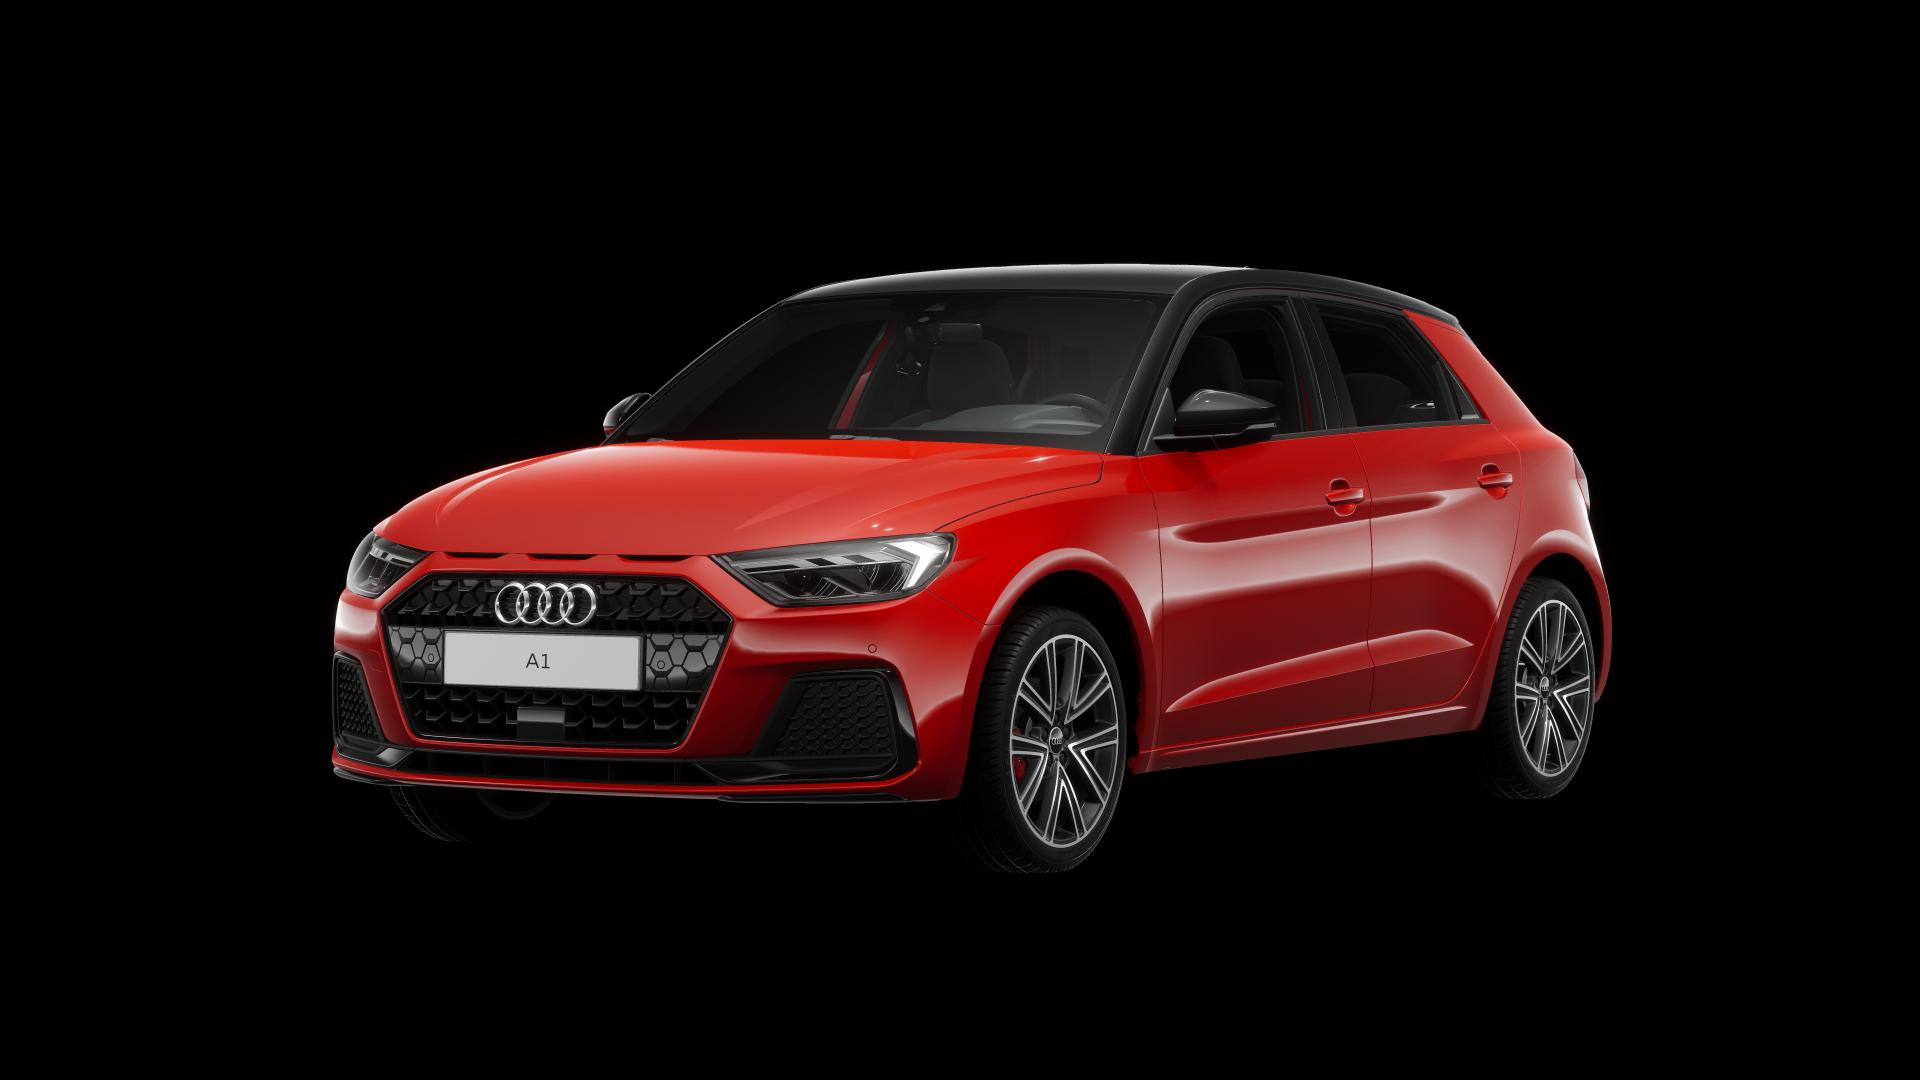 Audi A1 Sportback advanced 25 TFSI  70(95) kW(pk) 5 versnellingen